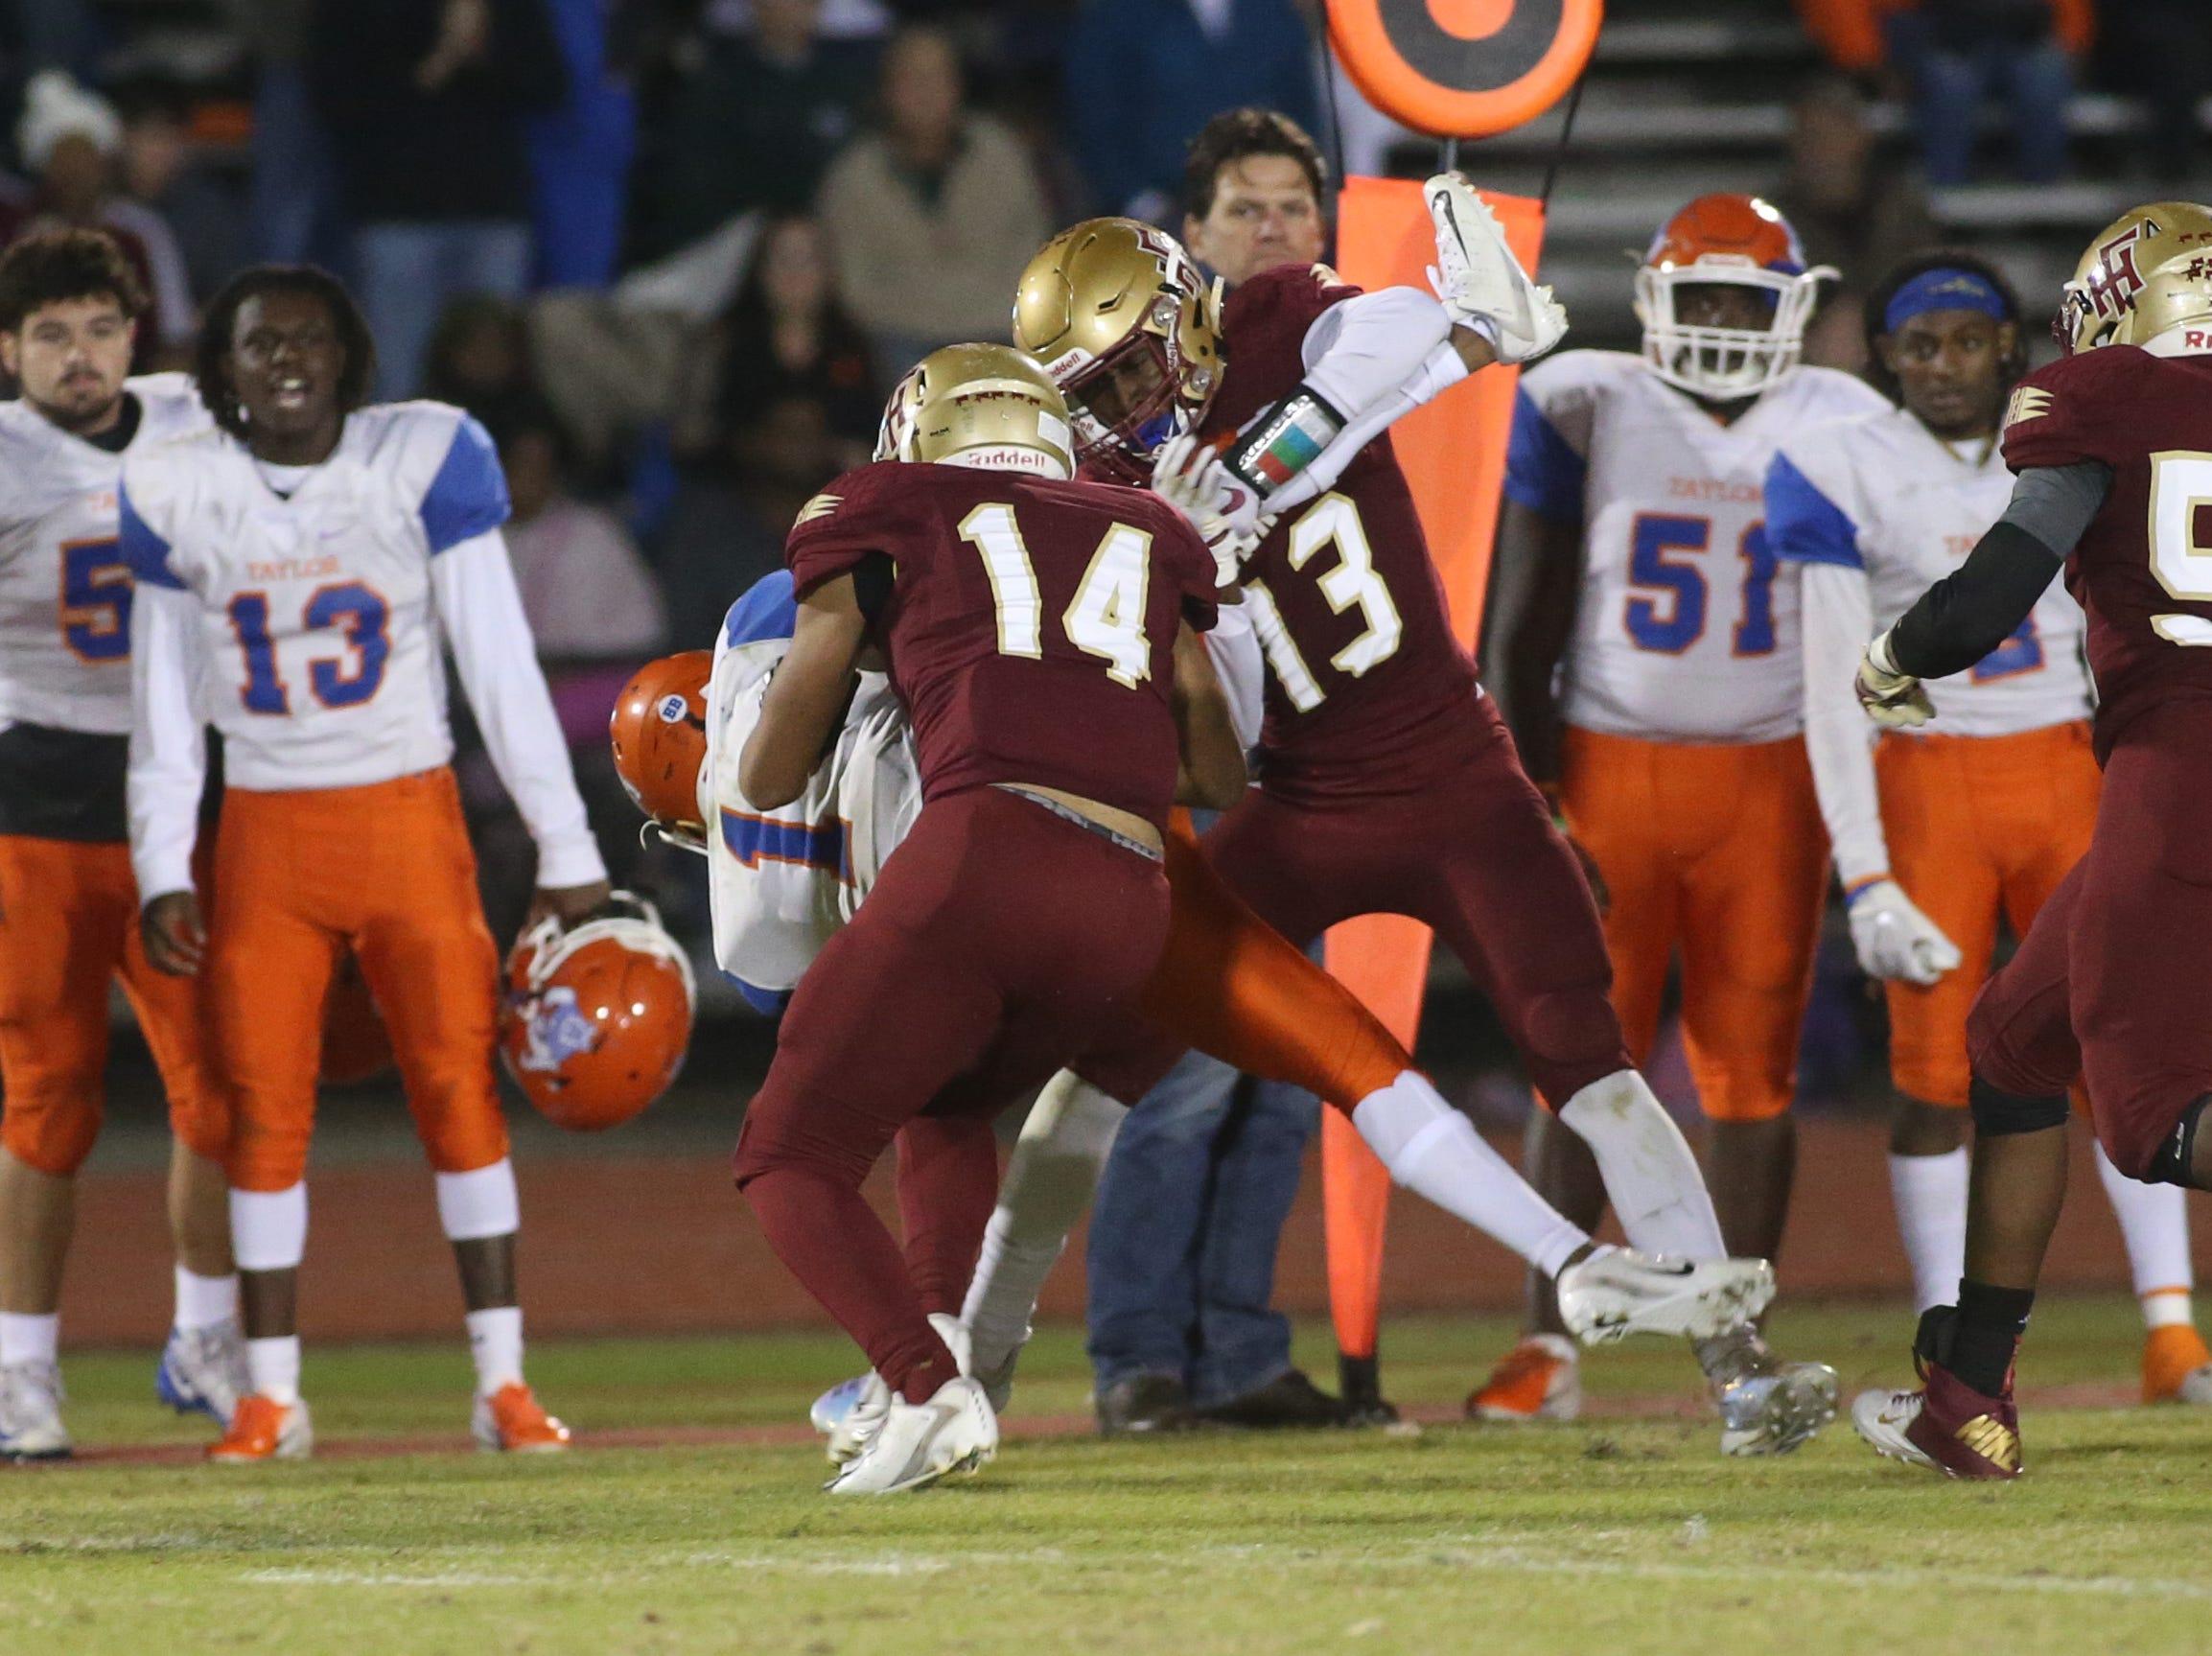 Florida High Seminoles free safety Raymond Woodle (13) and middle linebacker Jordan Gilley (14) tackle Taylor County Bulldog quarterback Da'corian Bellamy (1) as the Taylor County Bulldogs play the Florida High Seminoles in a Region 1-3A final on Friday, Nov. 23, 2018.